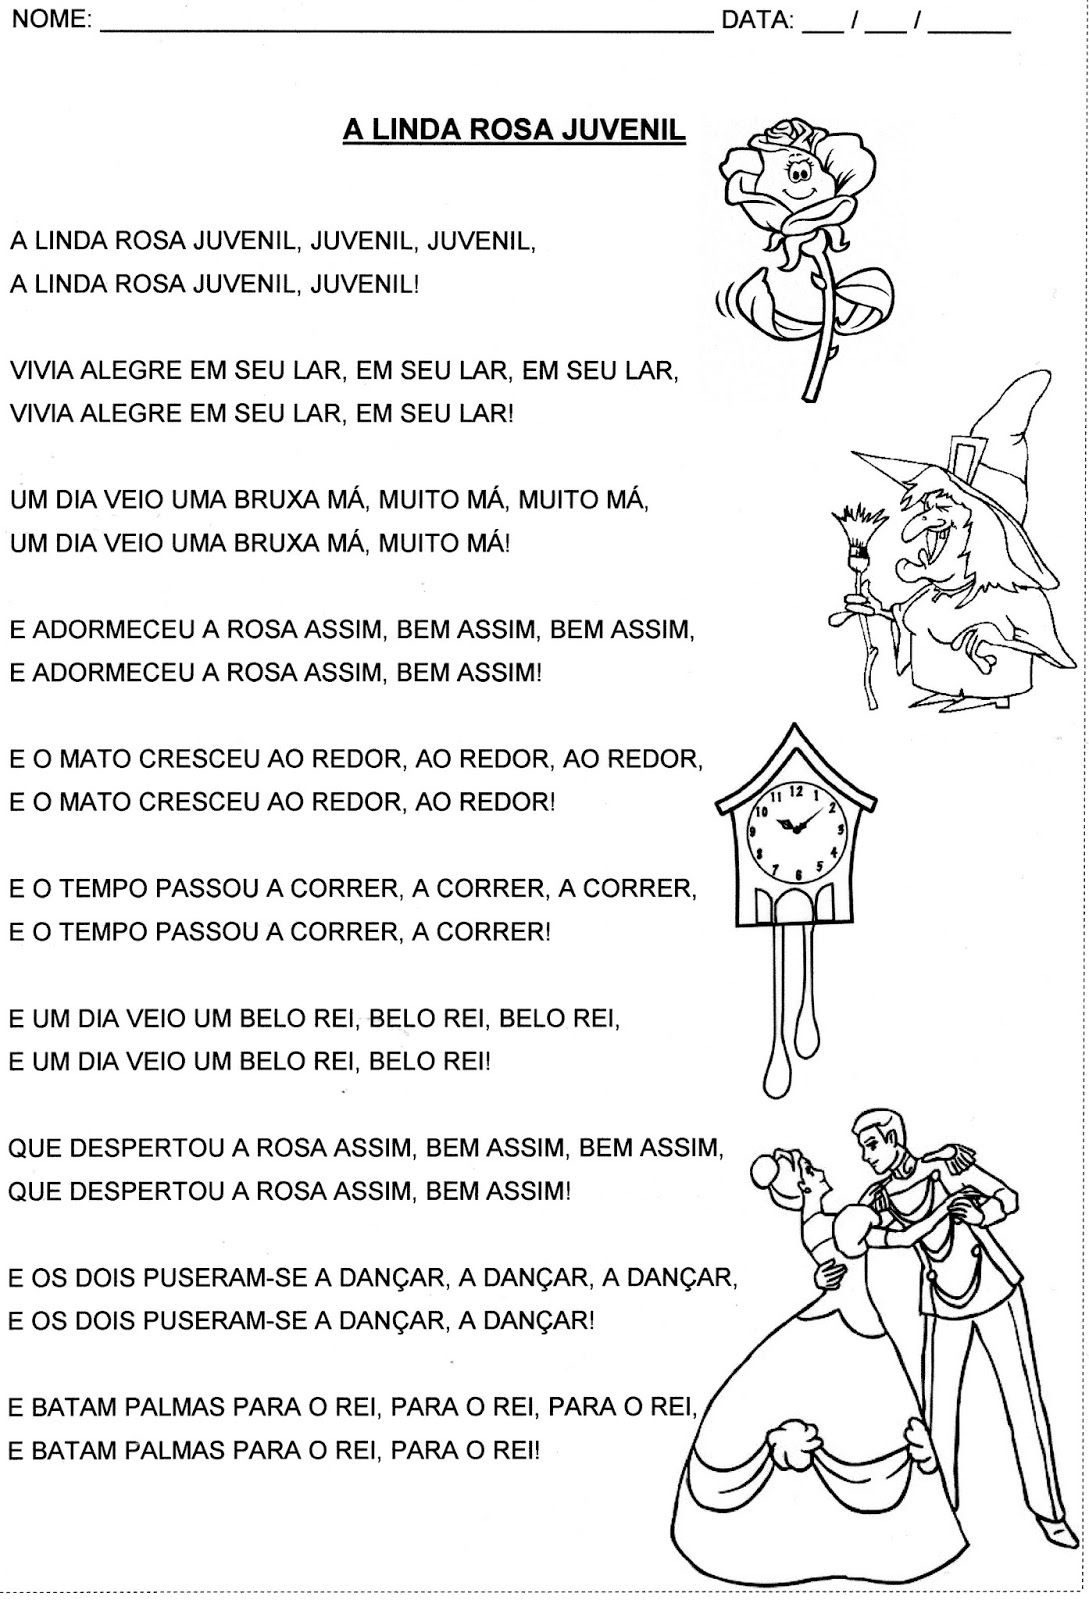 A Linda Rosa Juvenil 281 29 Jpg 1089 1600 Linda Rosa Juvenil